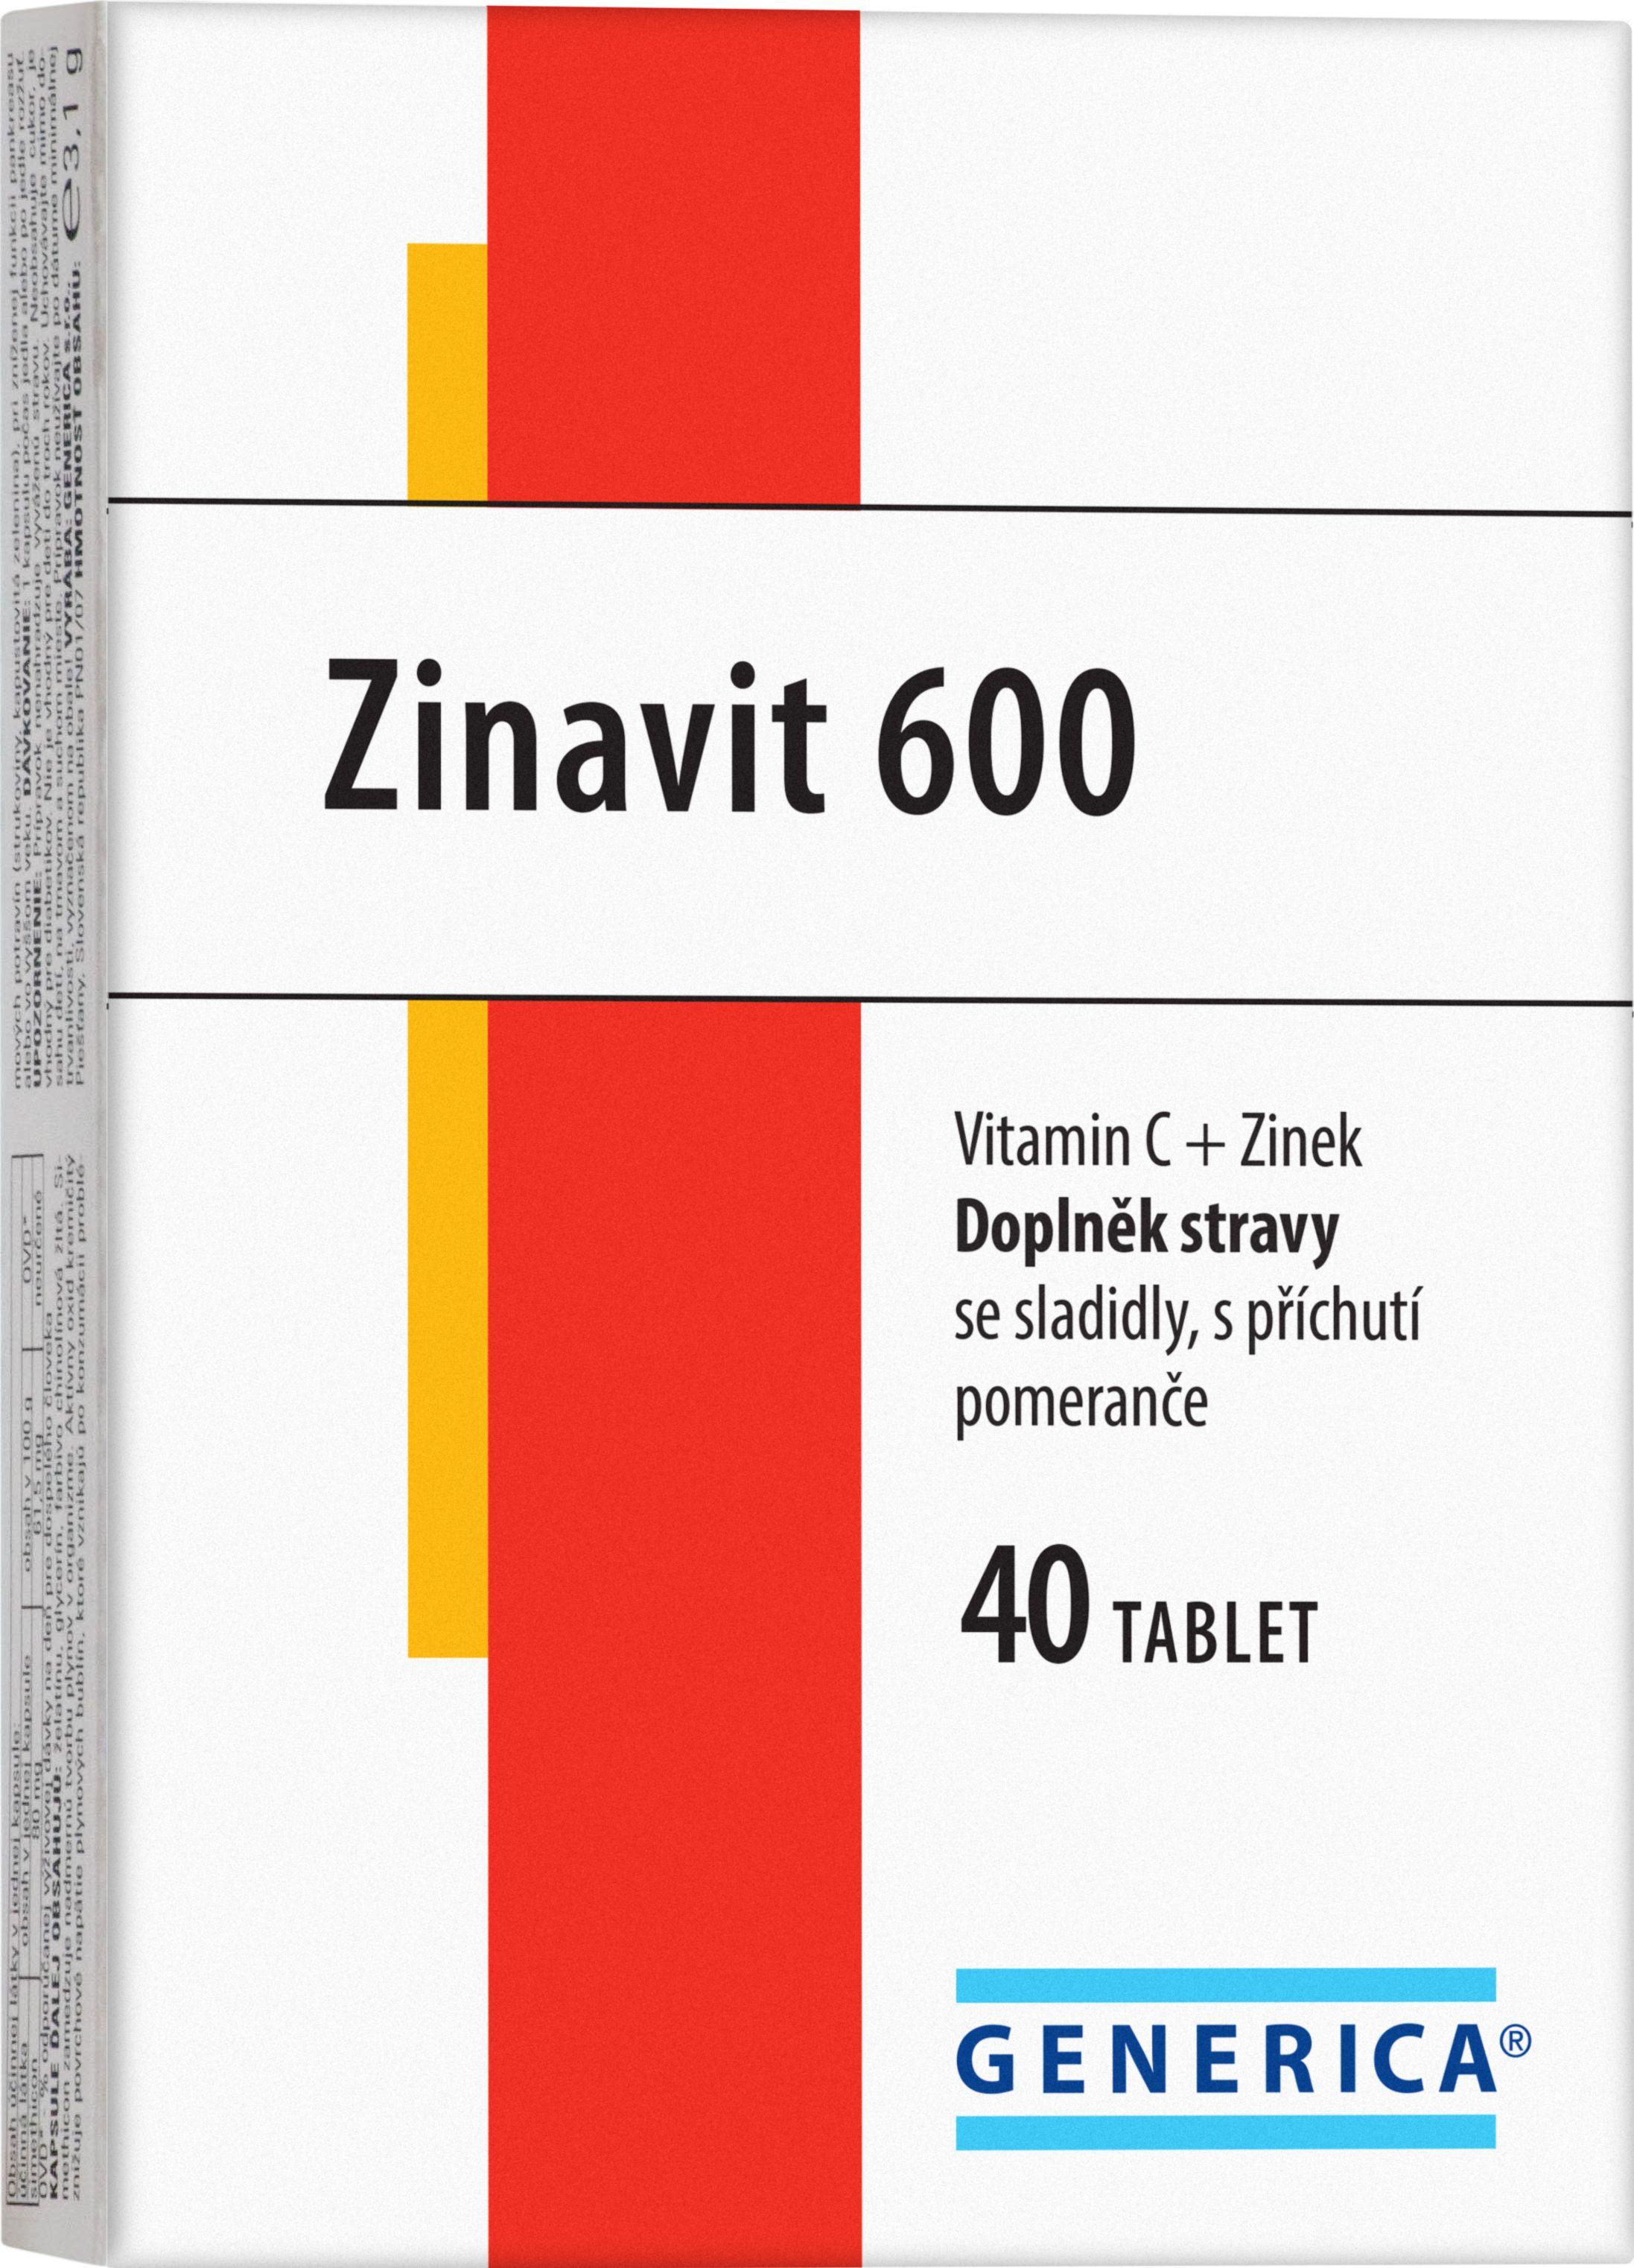 Generica Zinavit 600 40 cucavých tablet